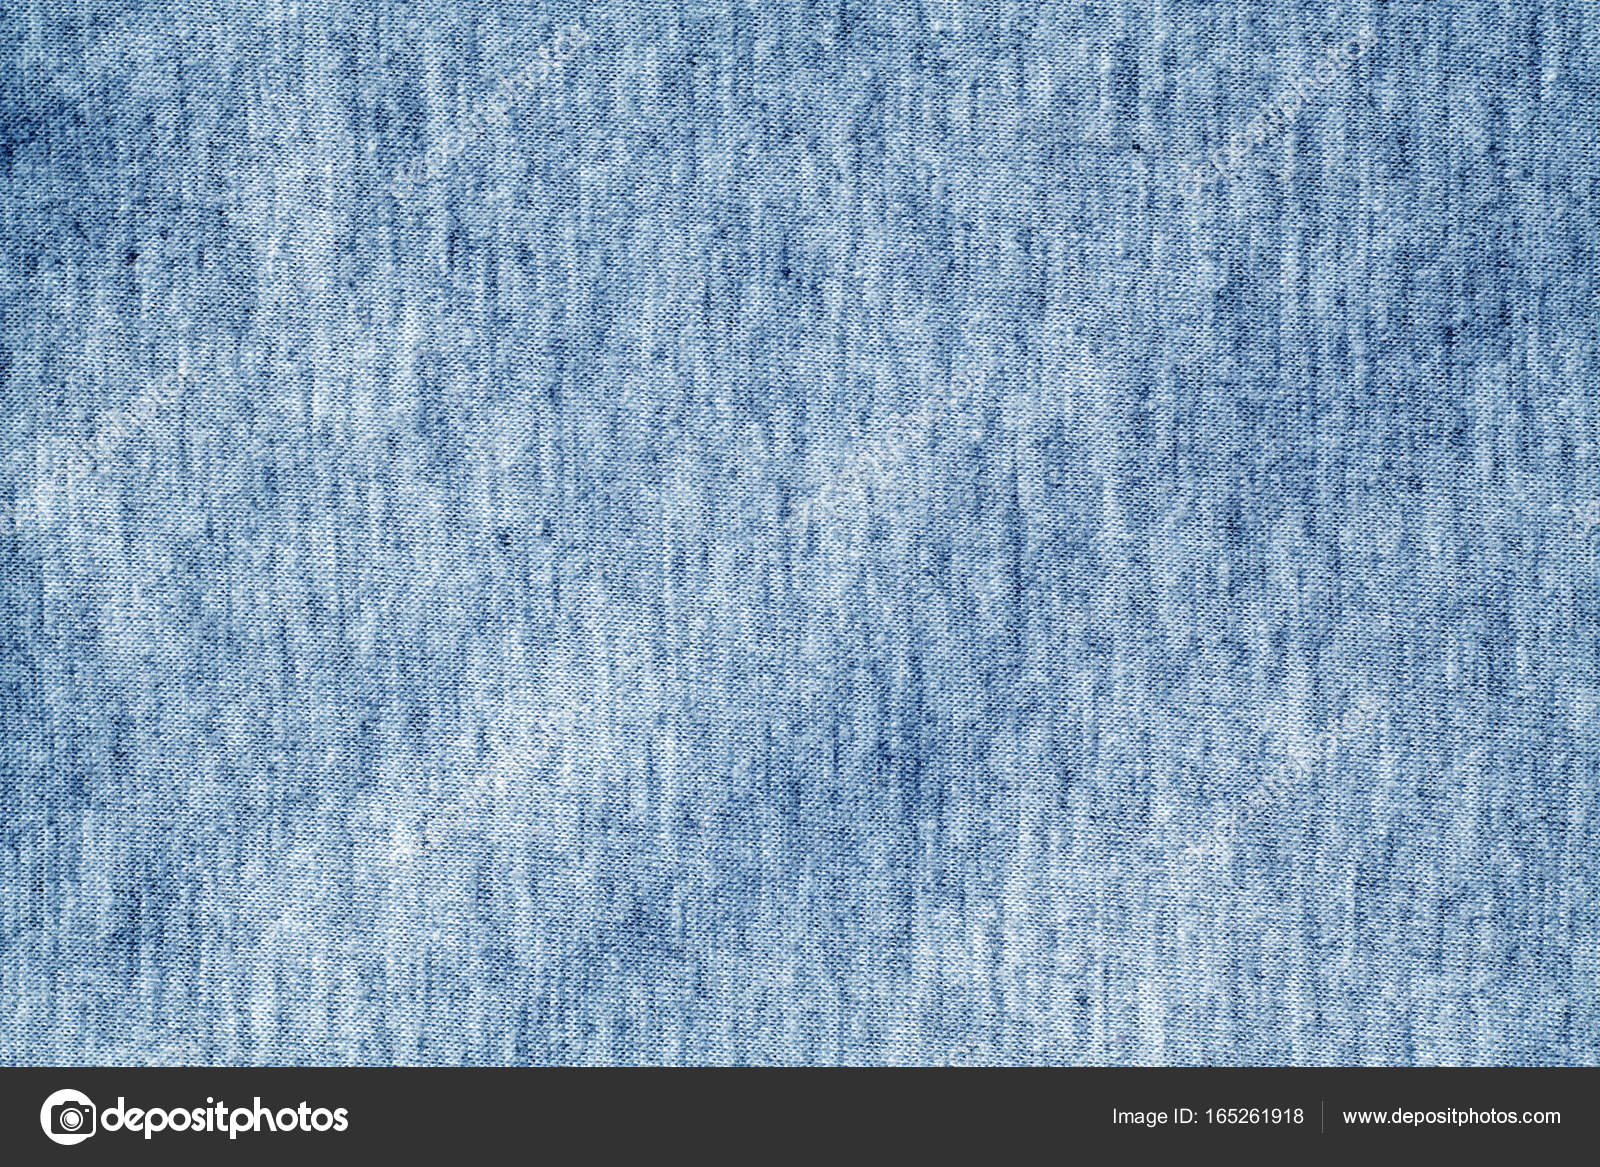 6881c1474e38d Mavi renk örgü elbise modeli — Stok Foto © pavelalexeev #165261918